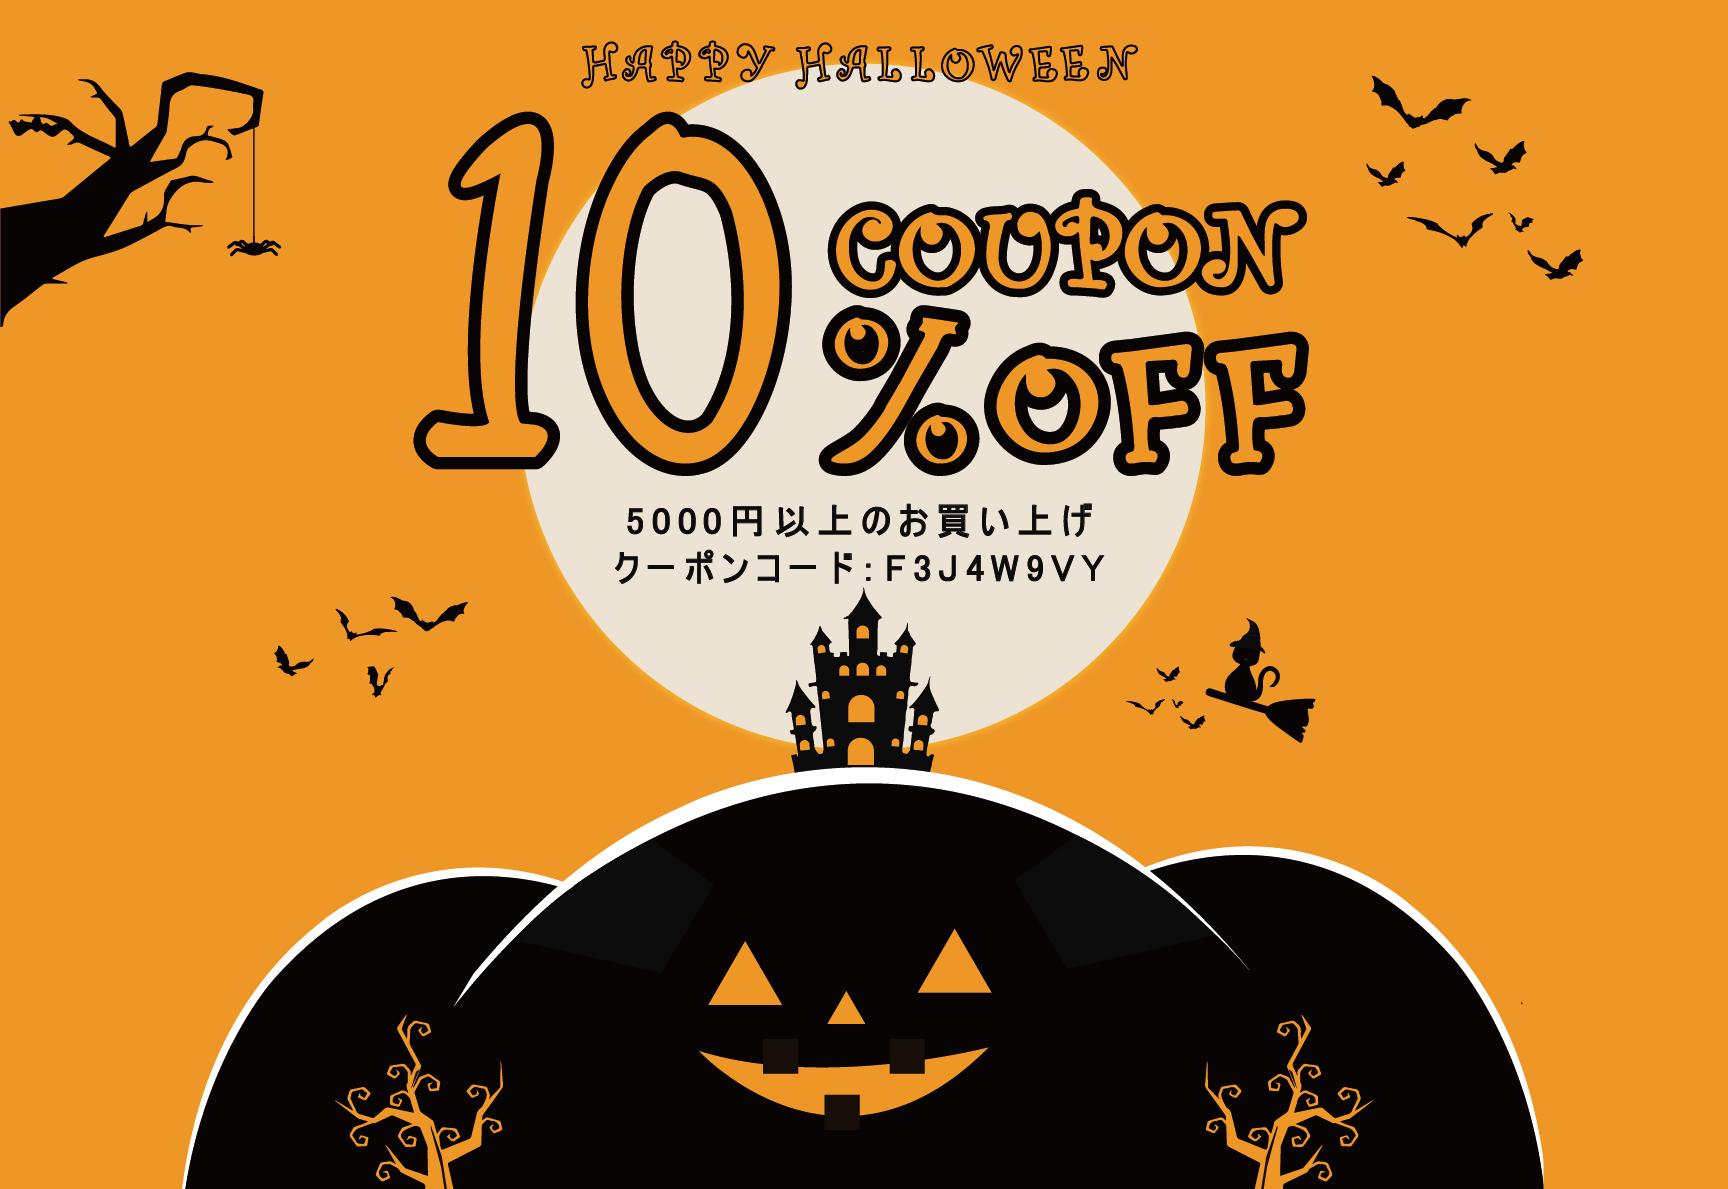 『Happy Halloween』お得な期間限定10%OFFクーポン配布中!!